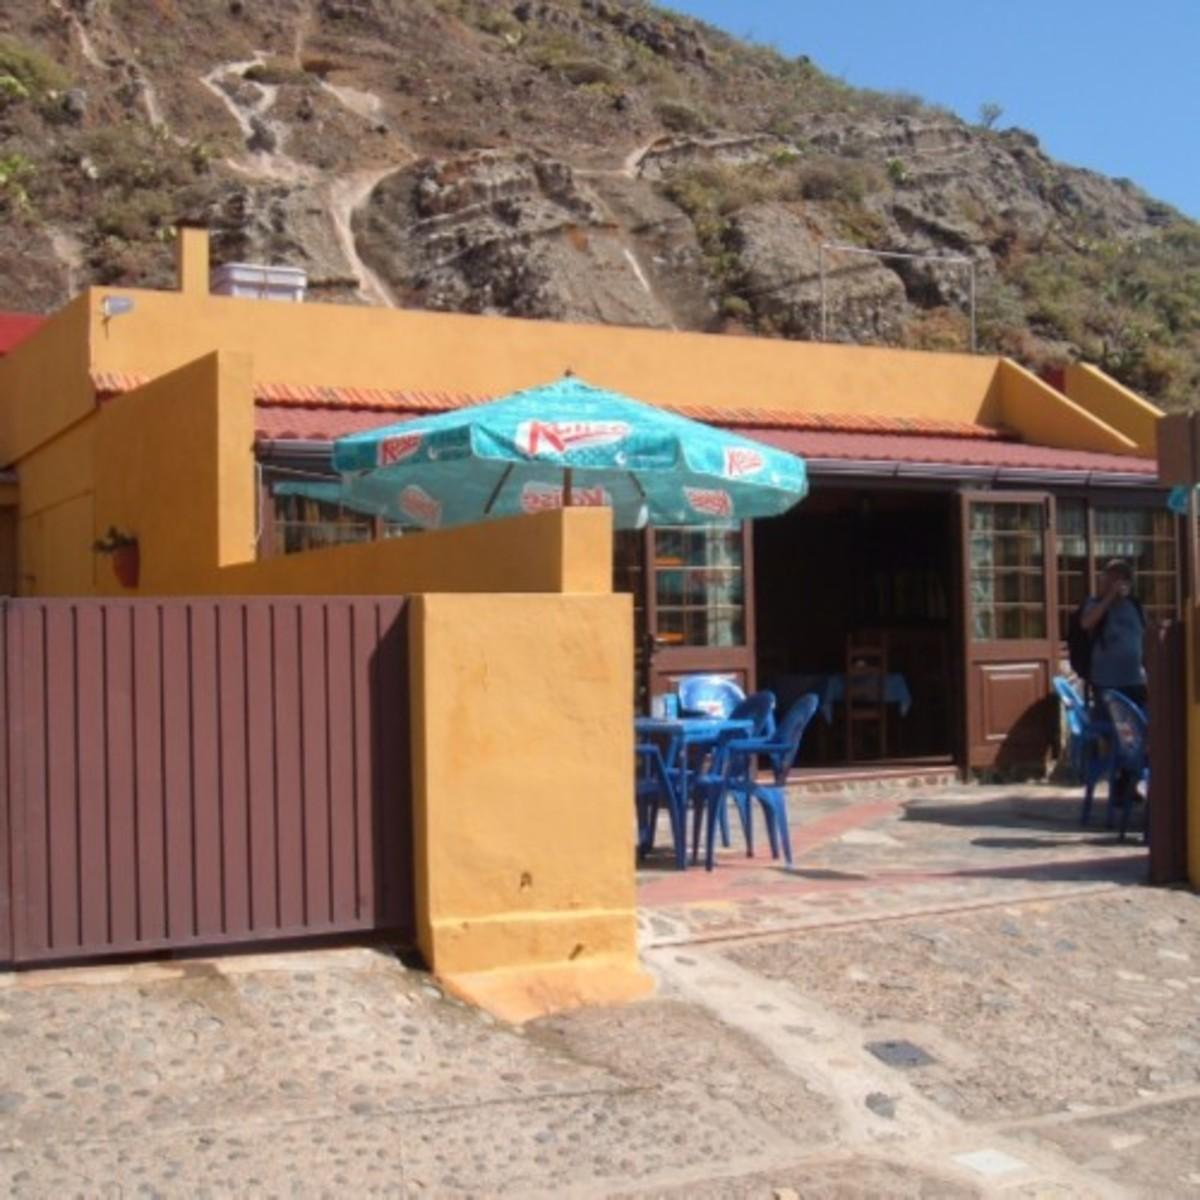 Chinamada's La Cueva bar and restaurant. Photo by Steve Andrews